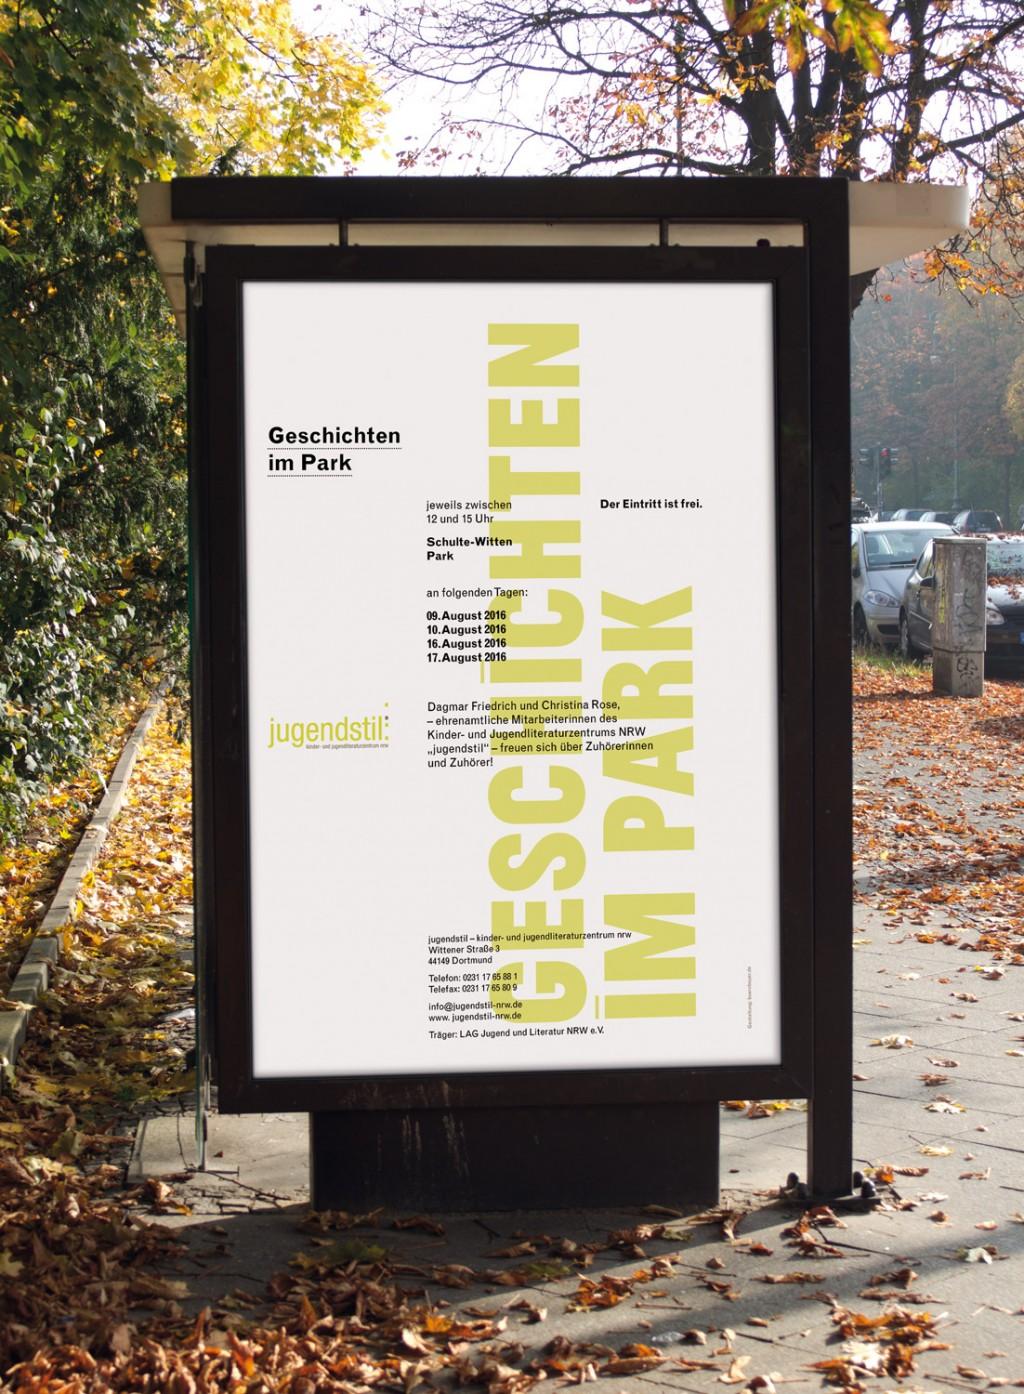 BüroBayer – Grafikdesign, Webdesign, Corporate Design aus Dortmund - Büro für Gestaltung Jugendstil NRW